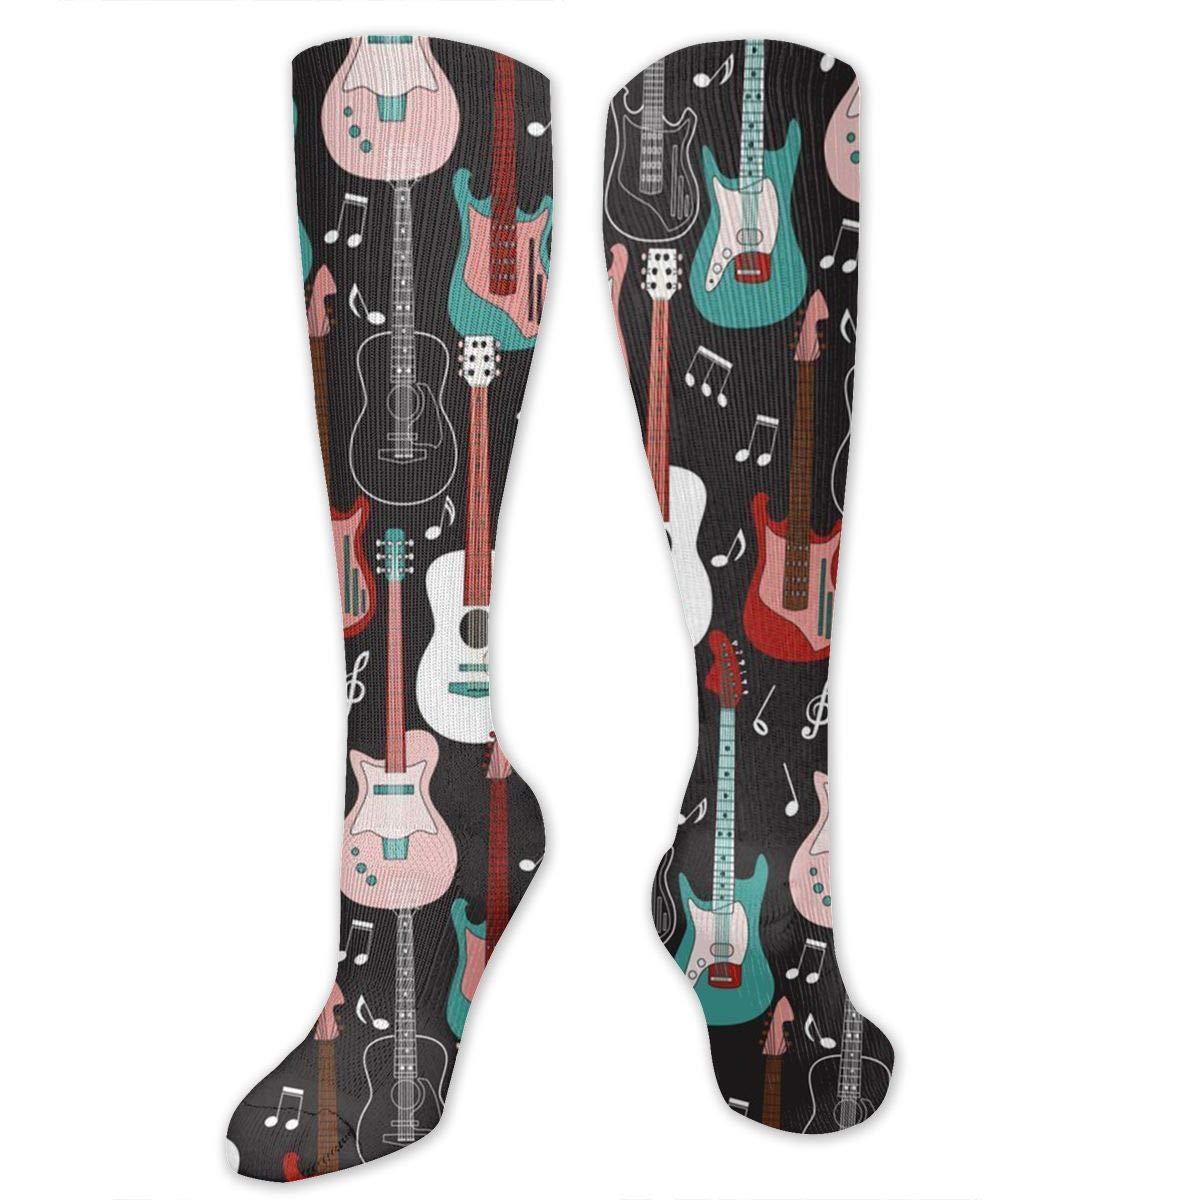 Guitar Rock And Roll Unisex Sports Socks Tube Socks Knee High Compression Sports Athletic Socks Tube Stockings Long Socks